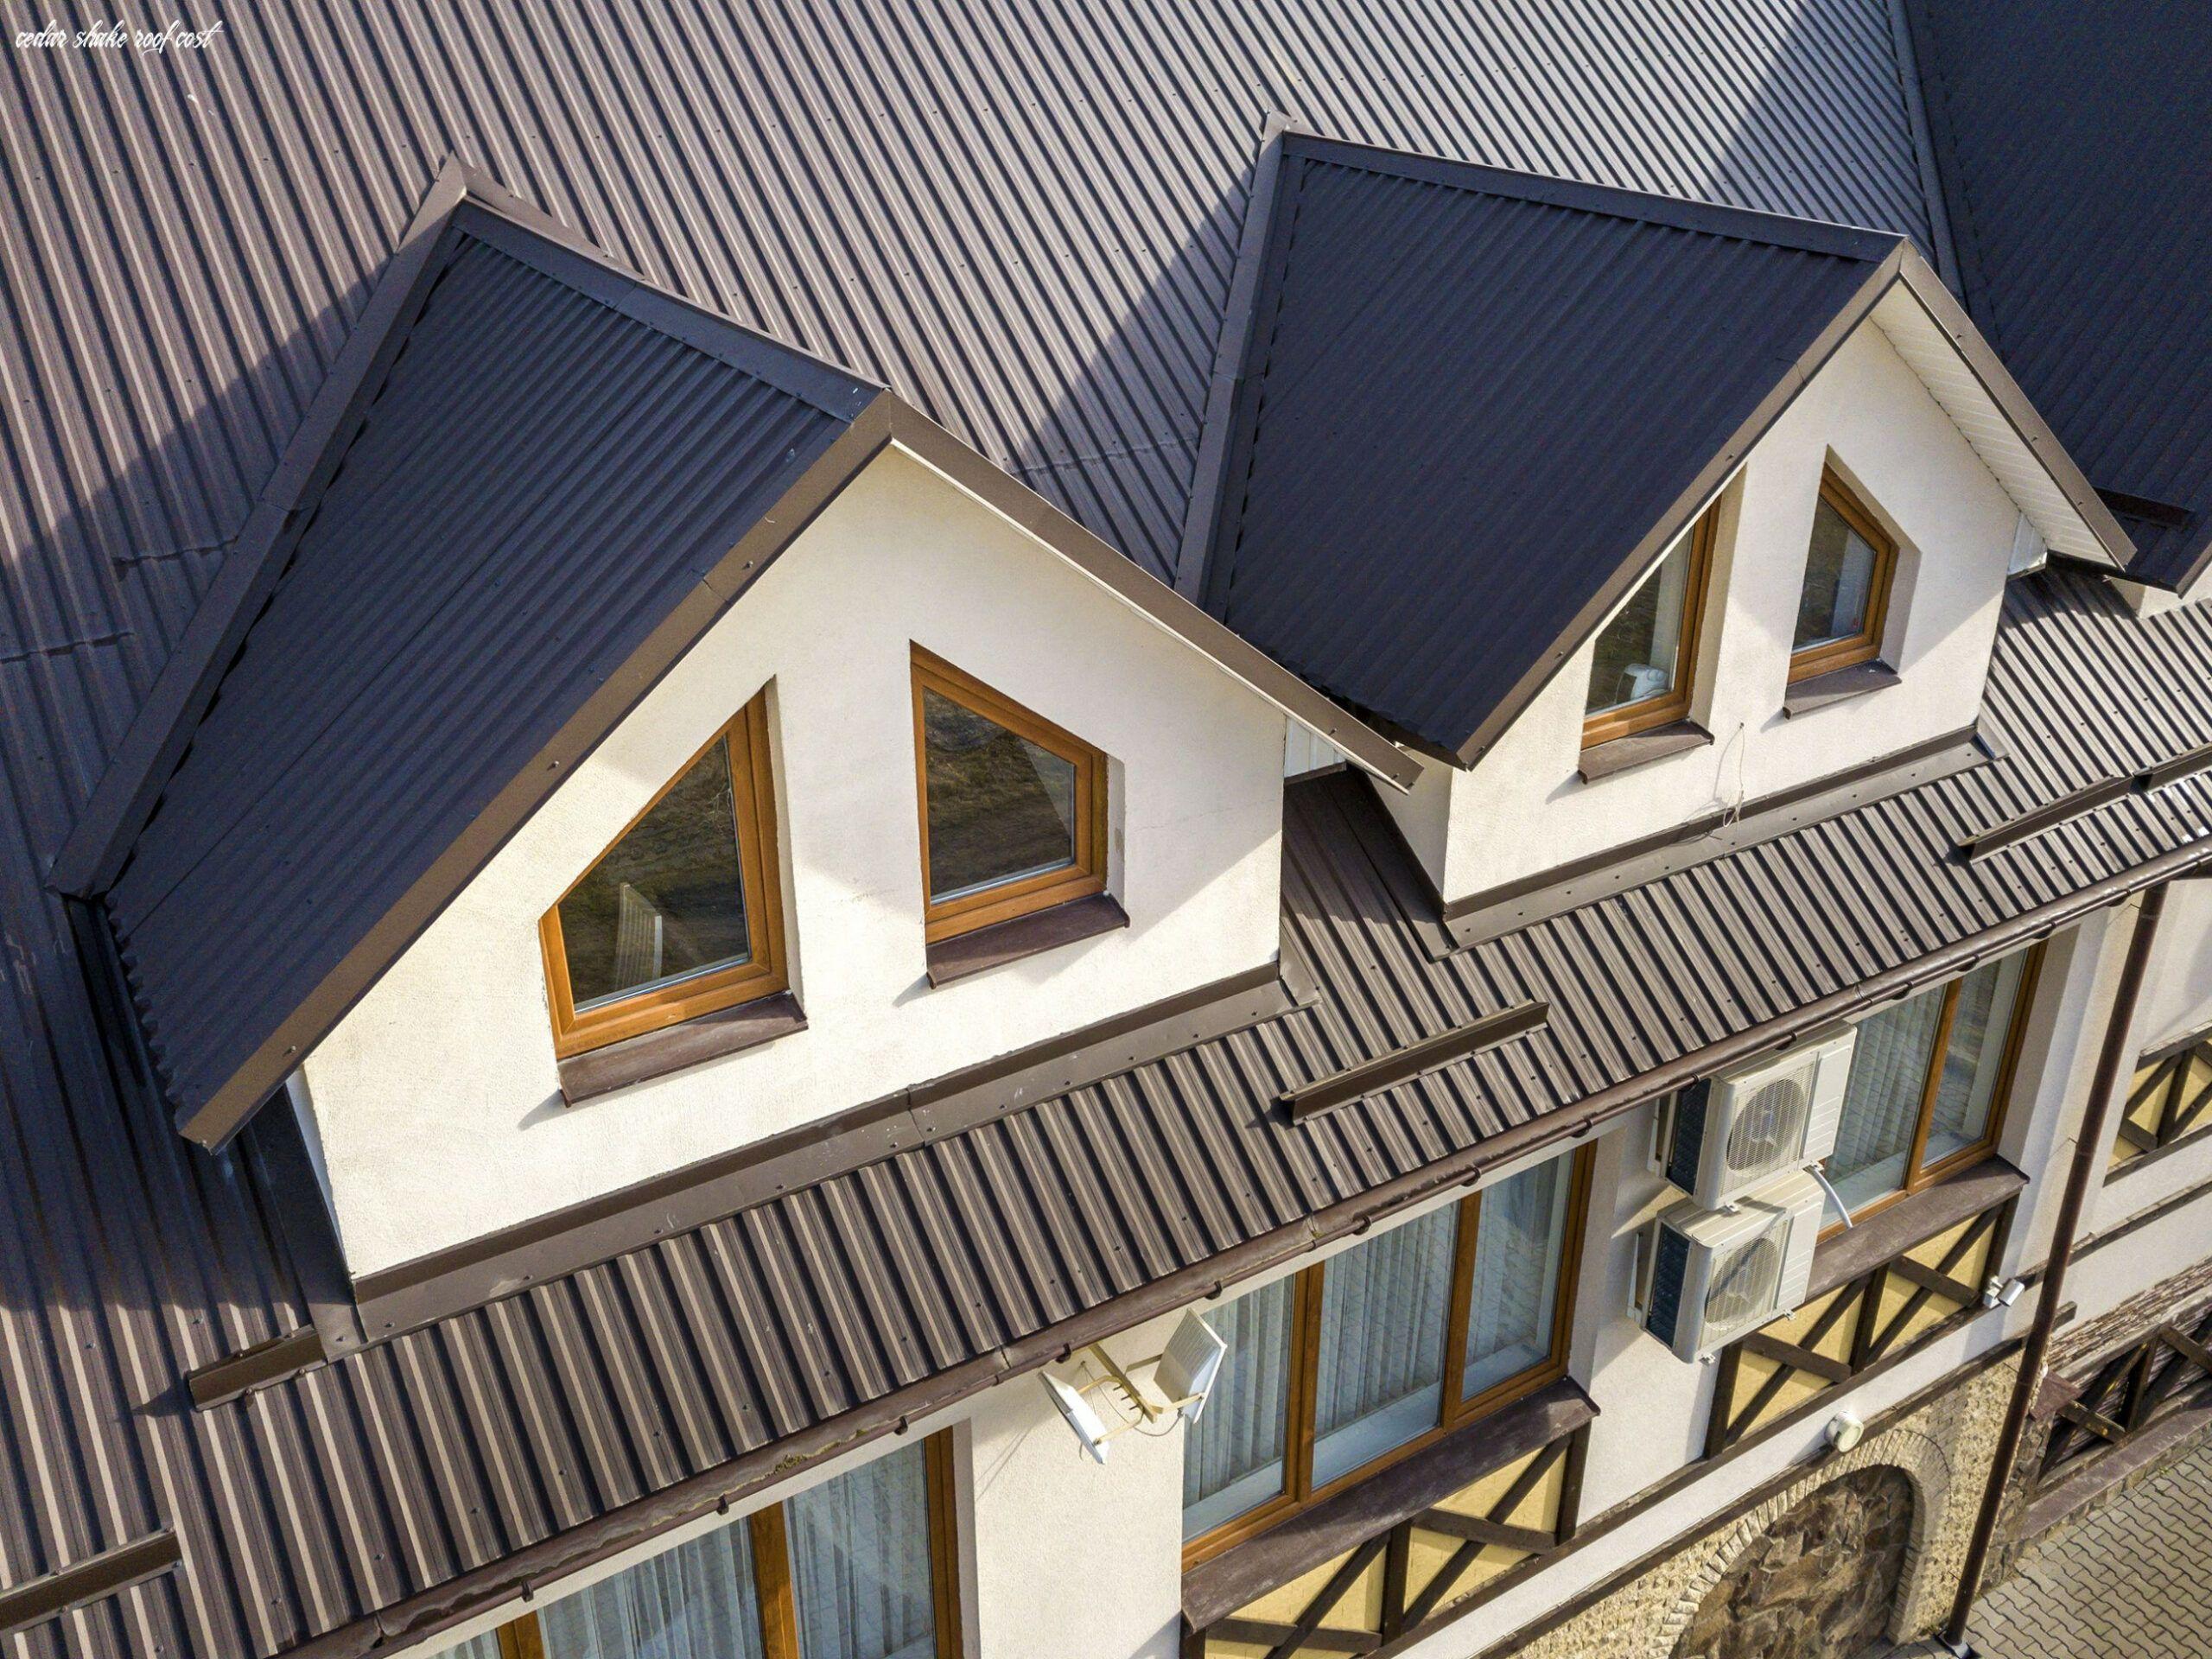 13 Cedar Shake Roof Cost In 2020 Metal Roof Cost Metal Roof Houses House Roof